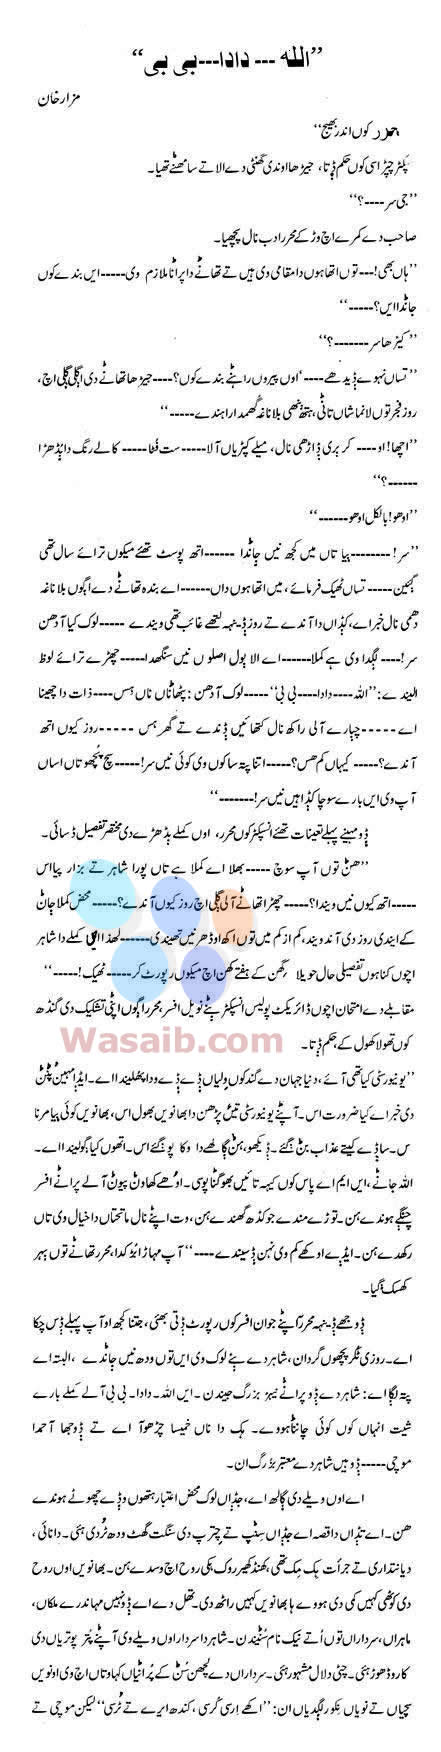 Seraiki Afsana Allah...Dada...Bibi (Mazar Khan) Part-1